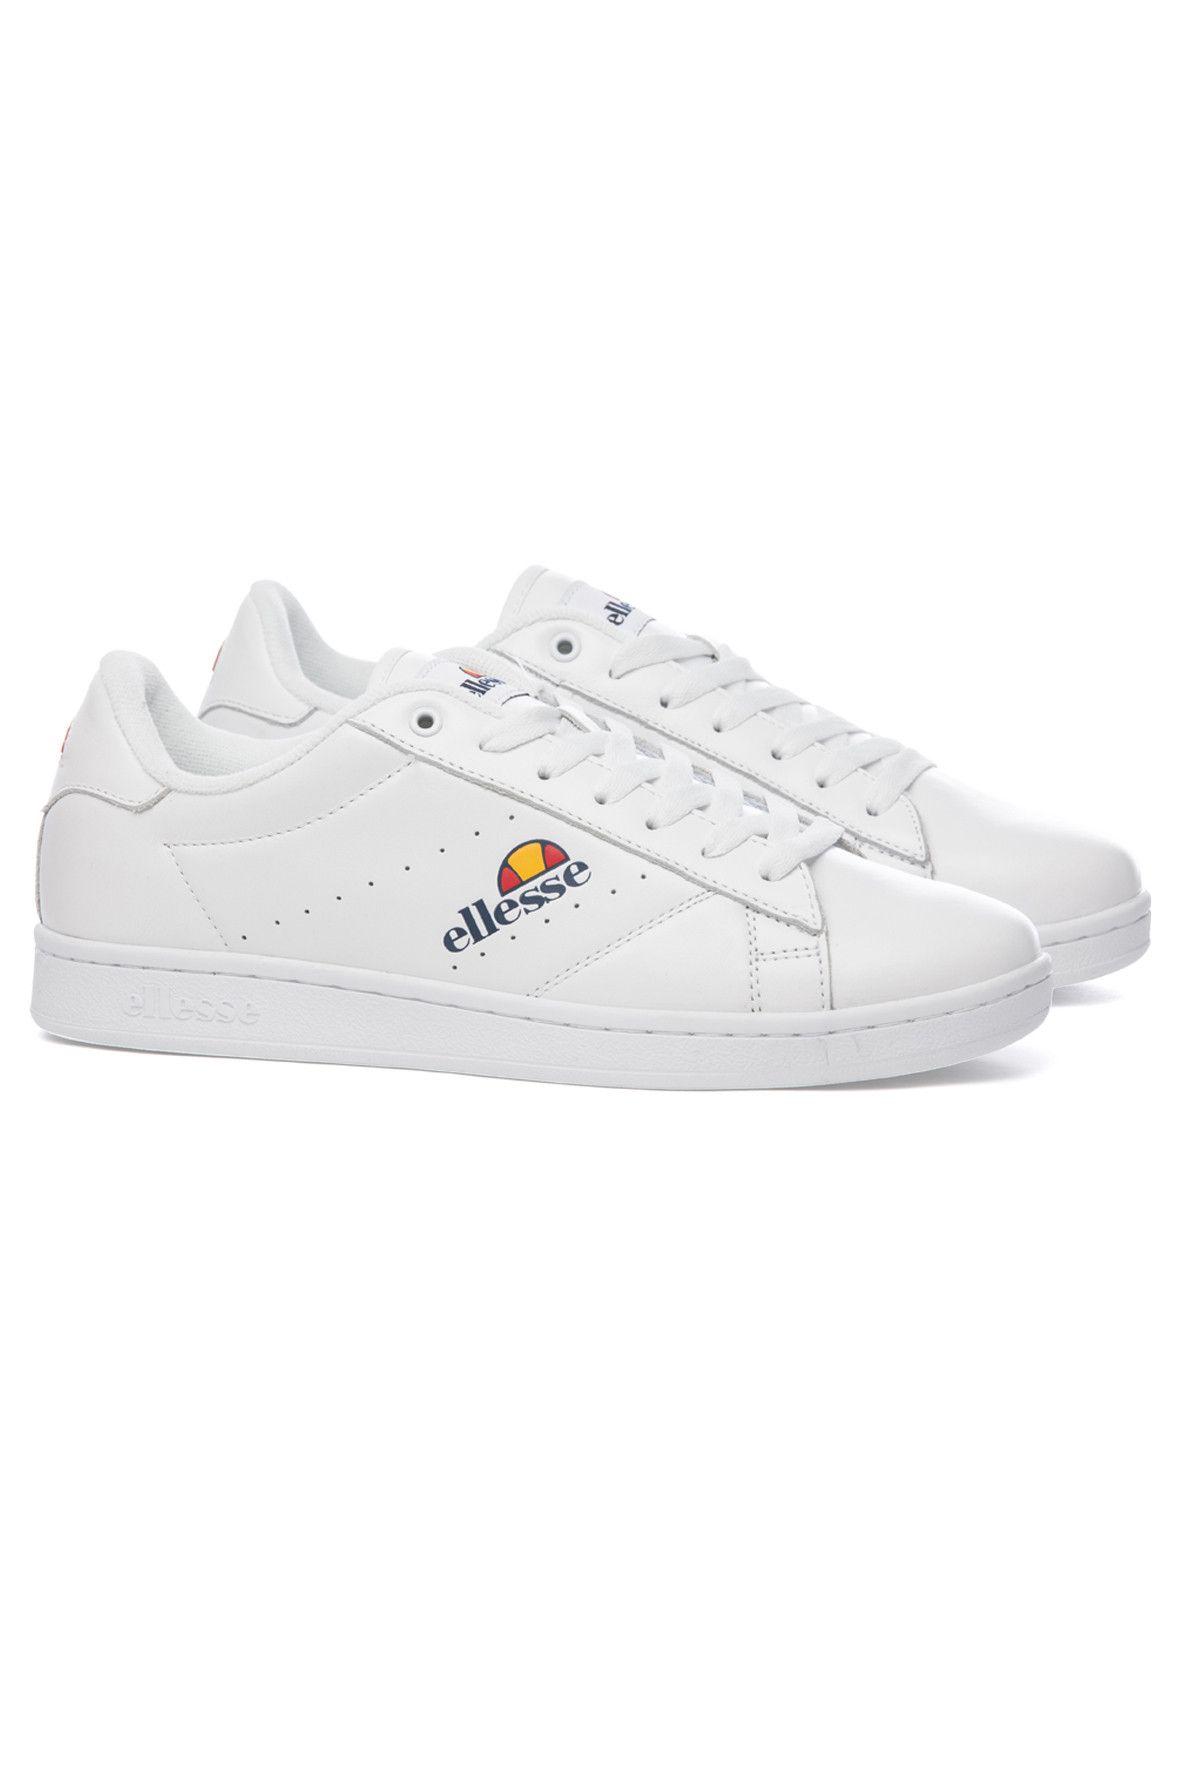 Anzia Trainer   Ellesse shoes, Perfect